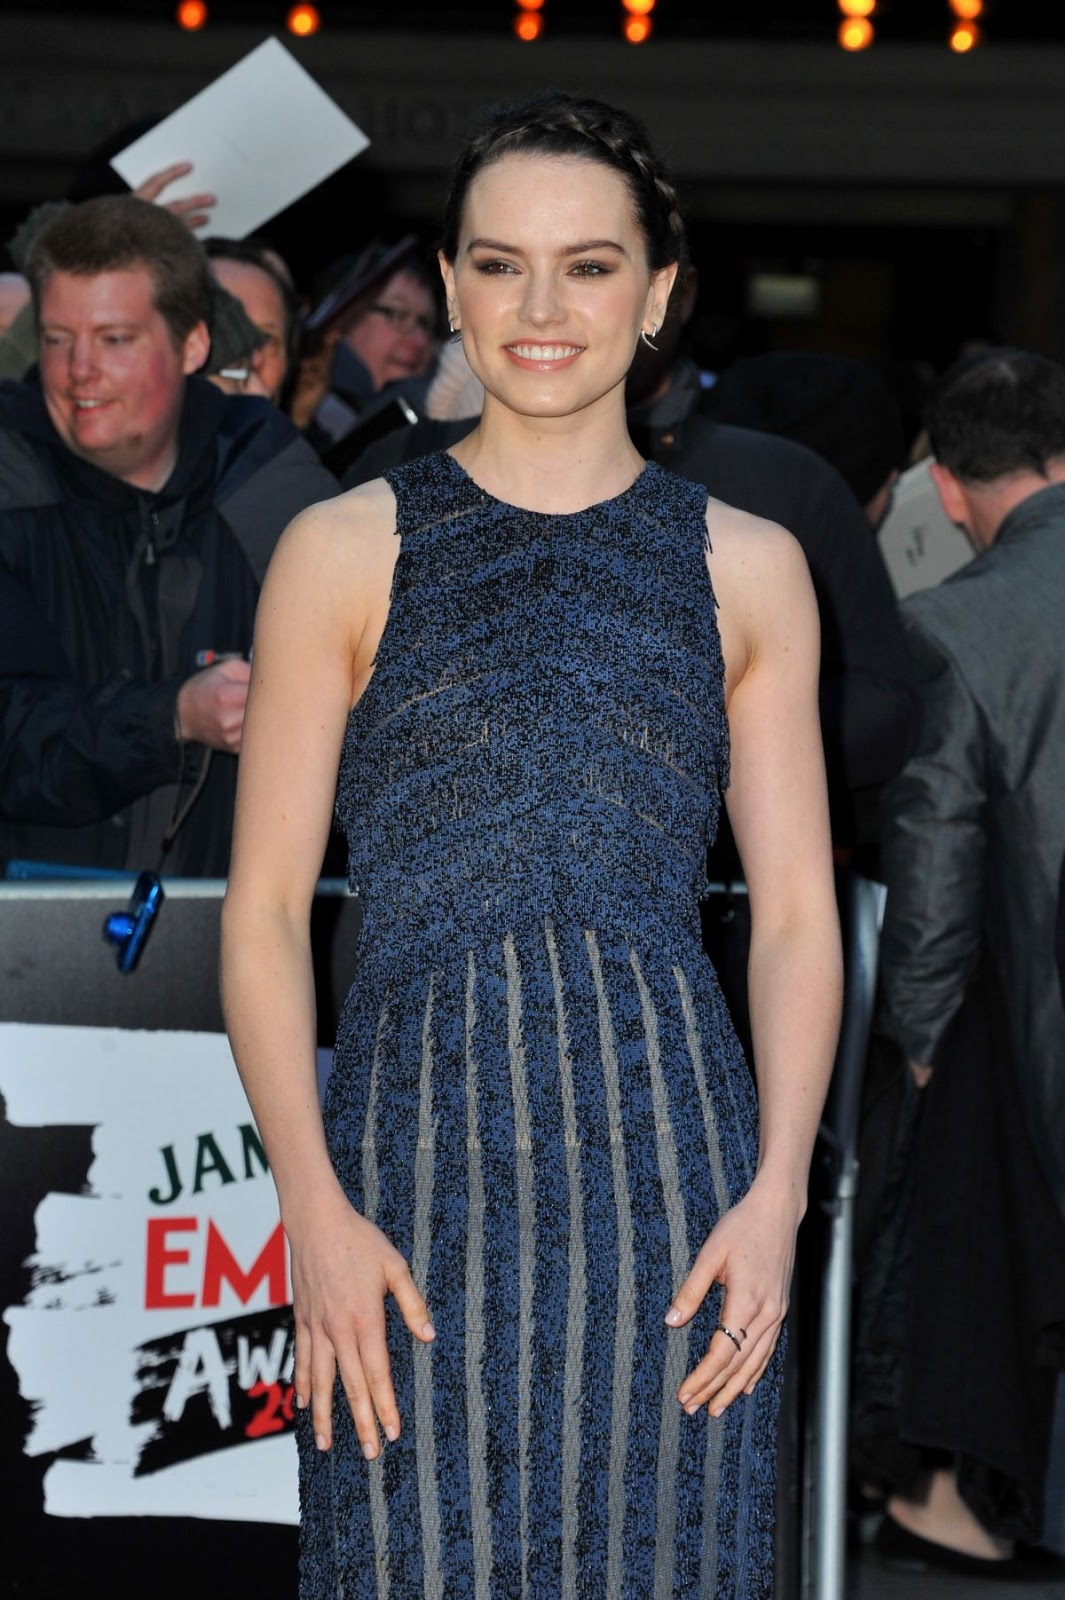 Star Wars - The Force Awakens actress Daisy Ridley at Empire Awards 2016